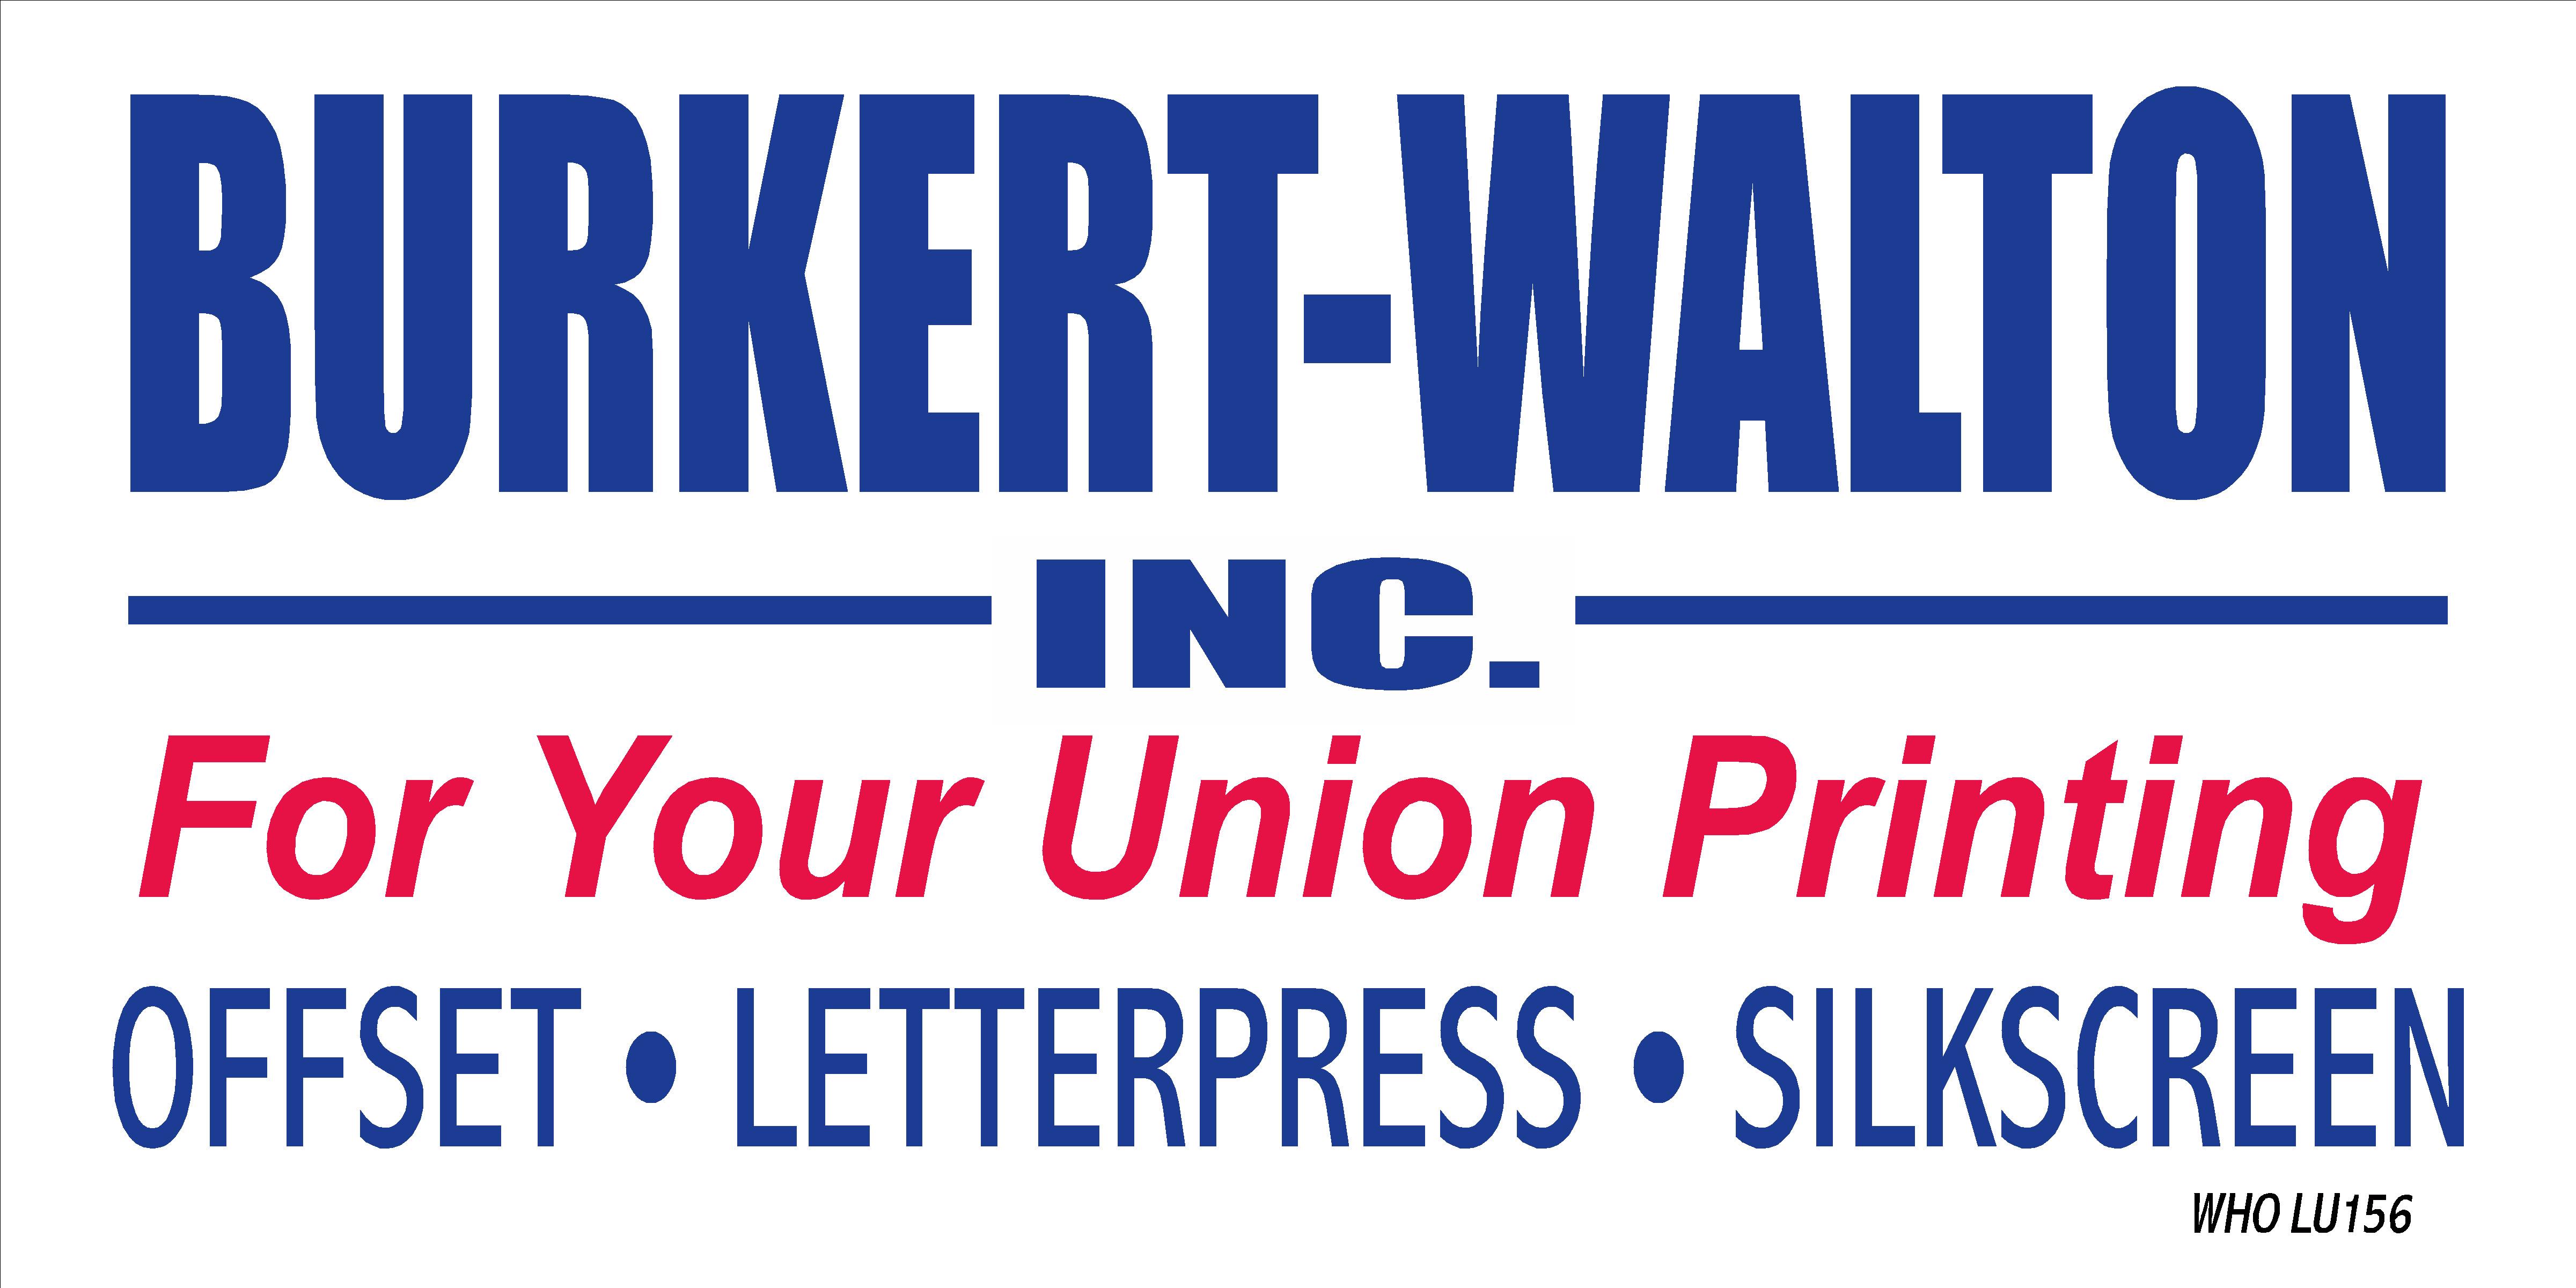 Burkert-Walton-Printing